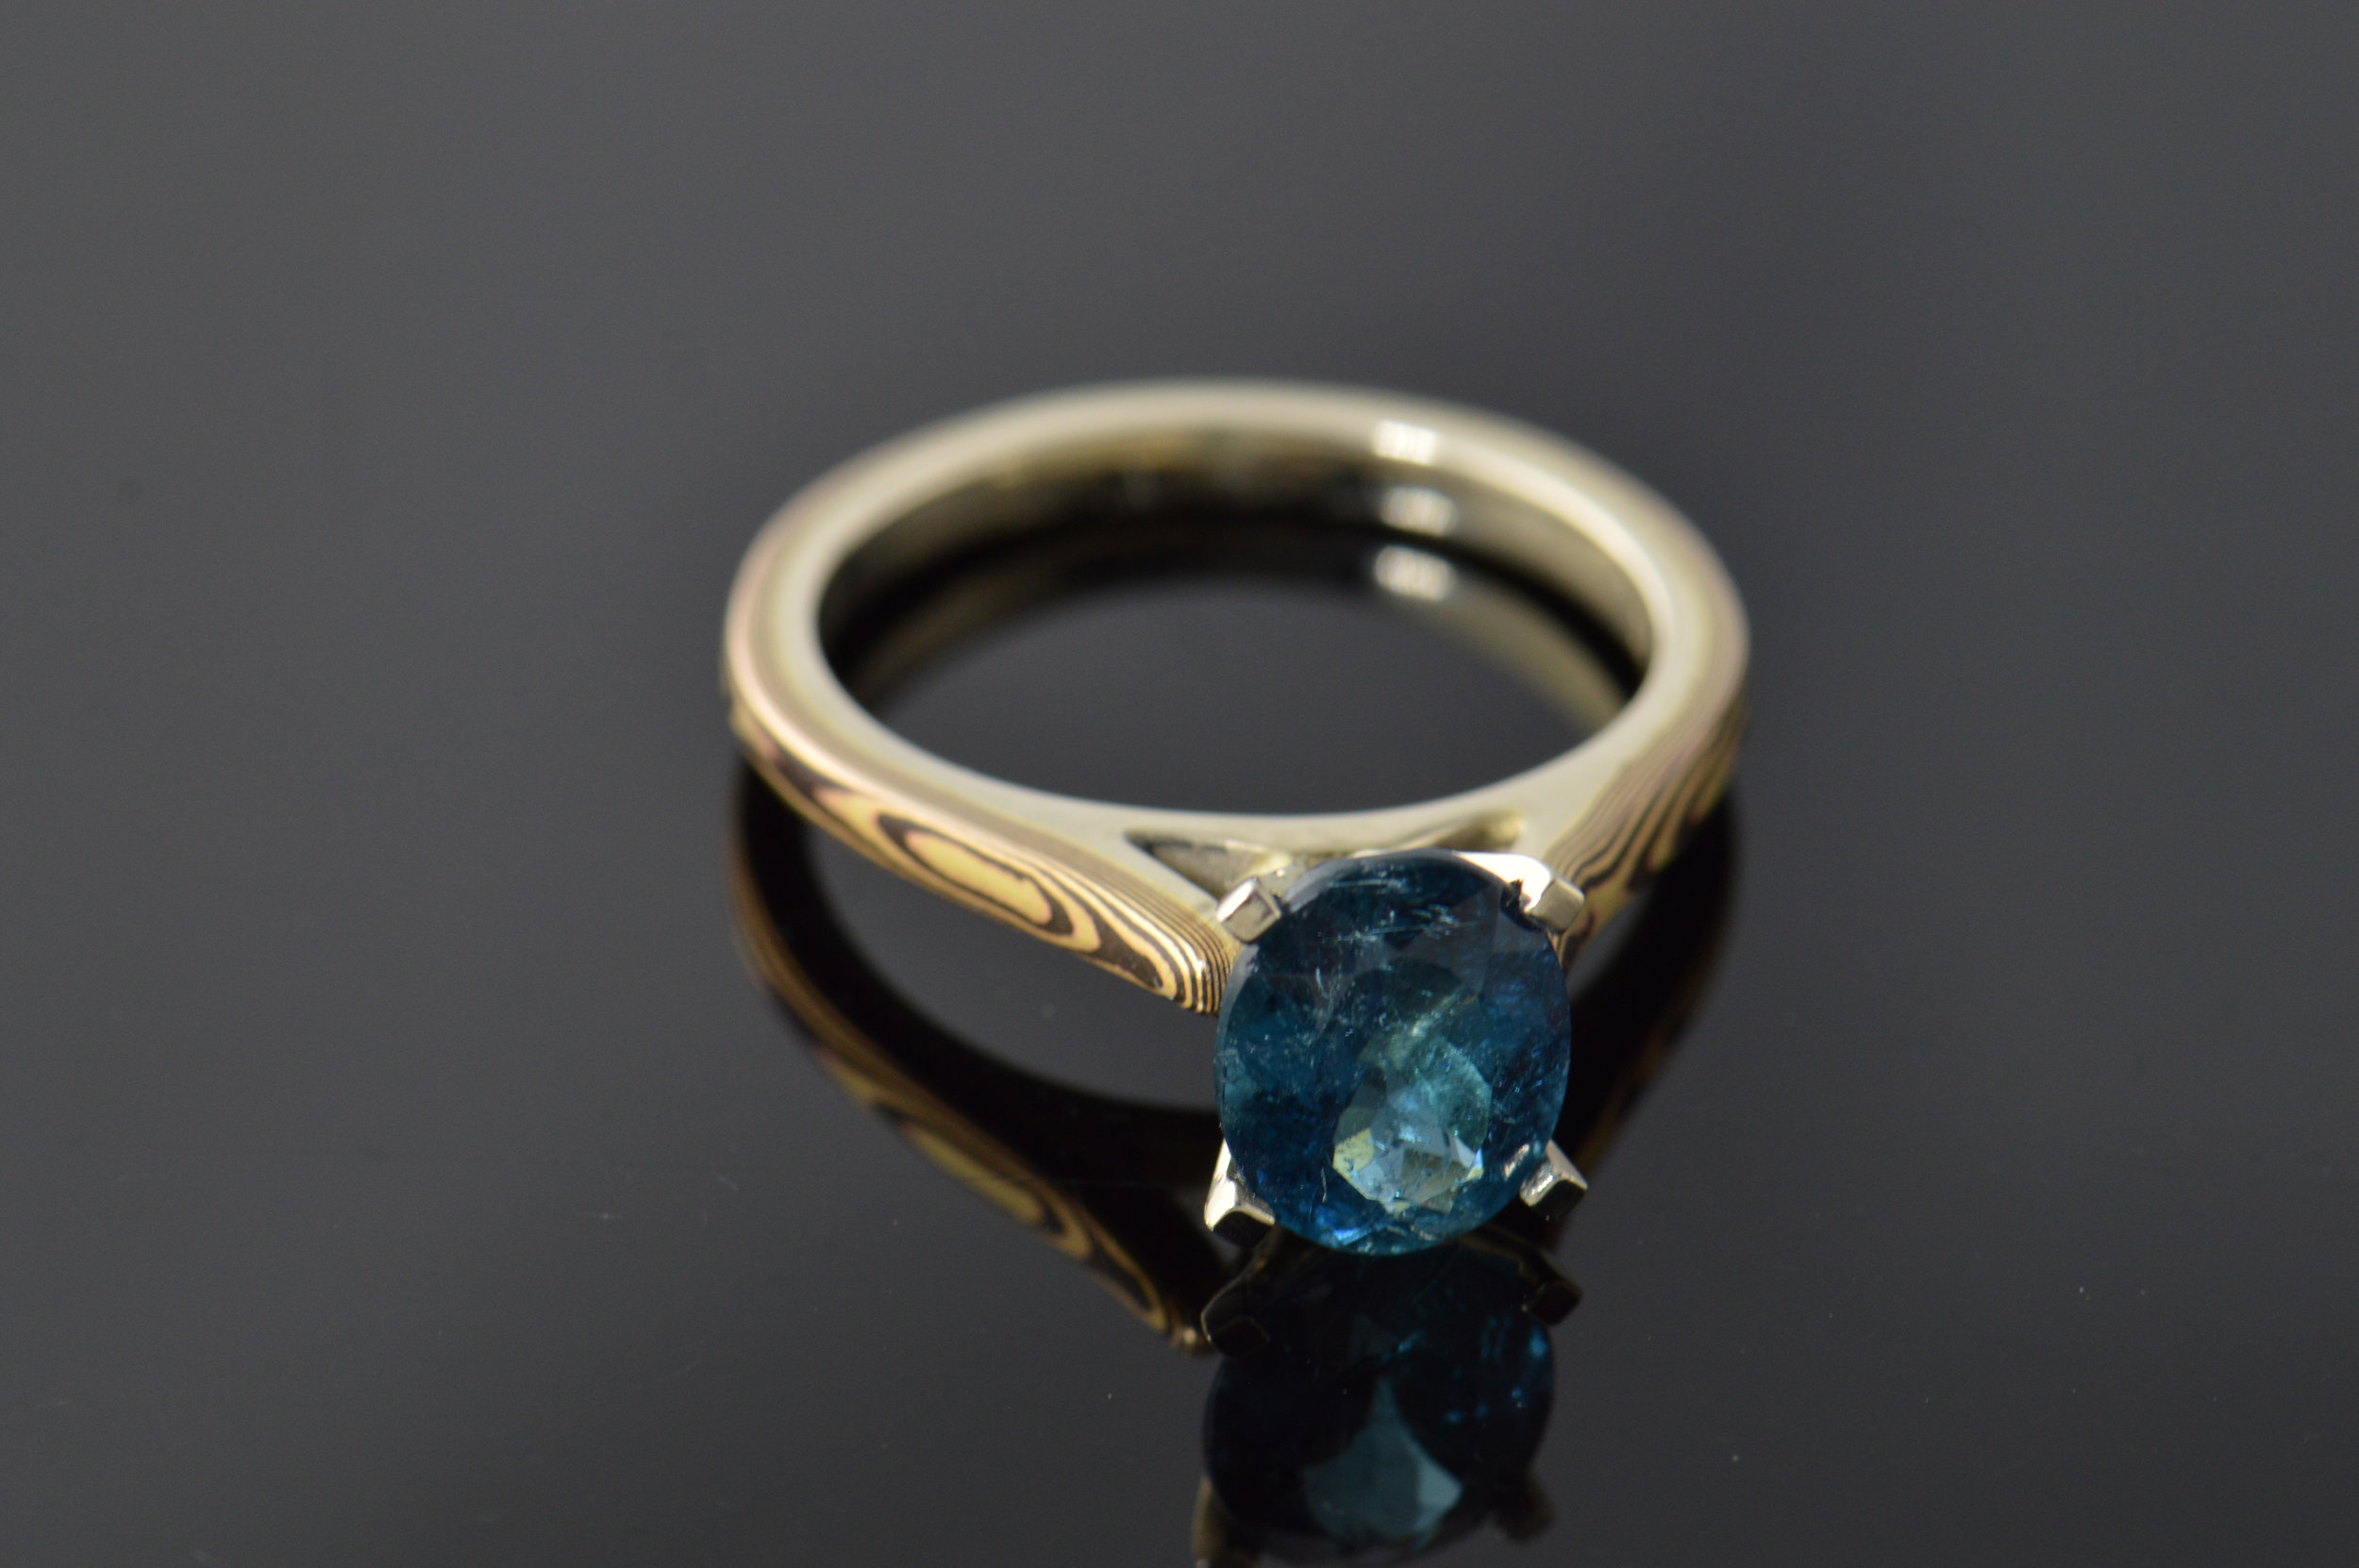 darvier-tourmaline-shakudo-18k-engagement-ring-18k.JPG